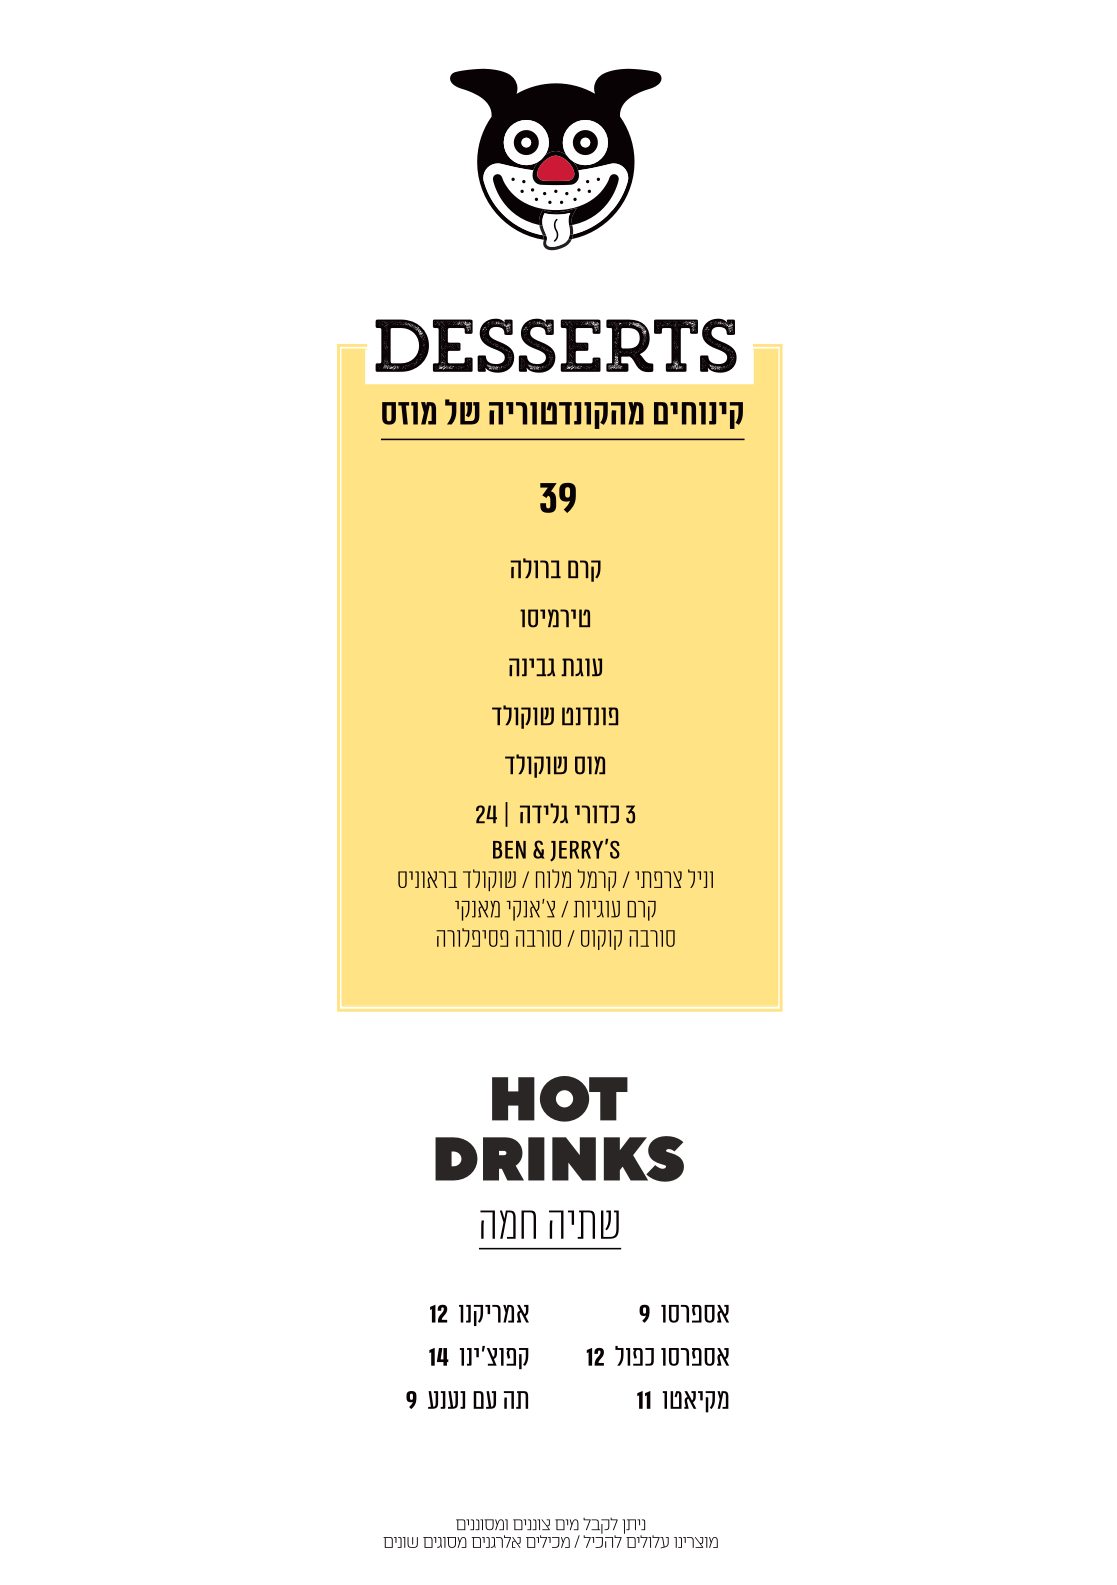 desserts - לא כשר